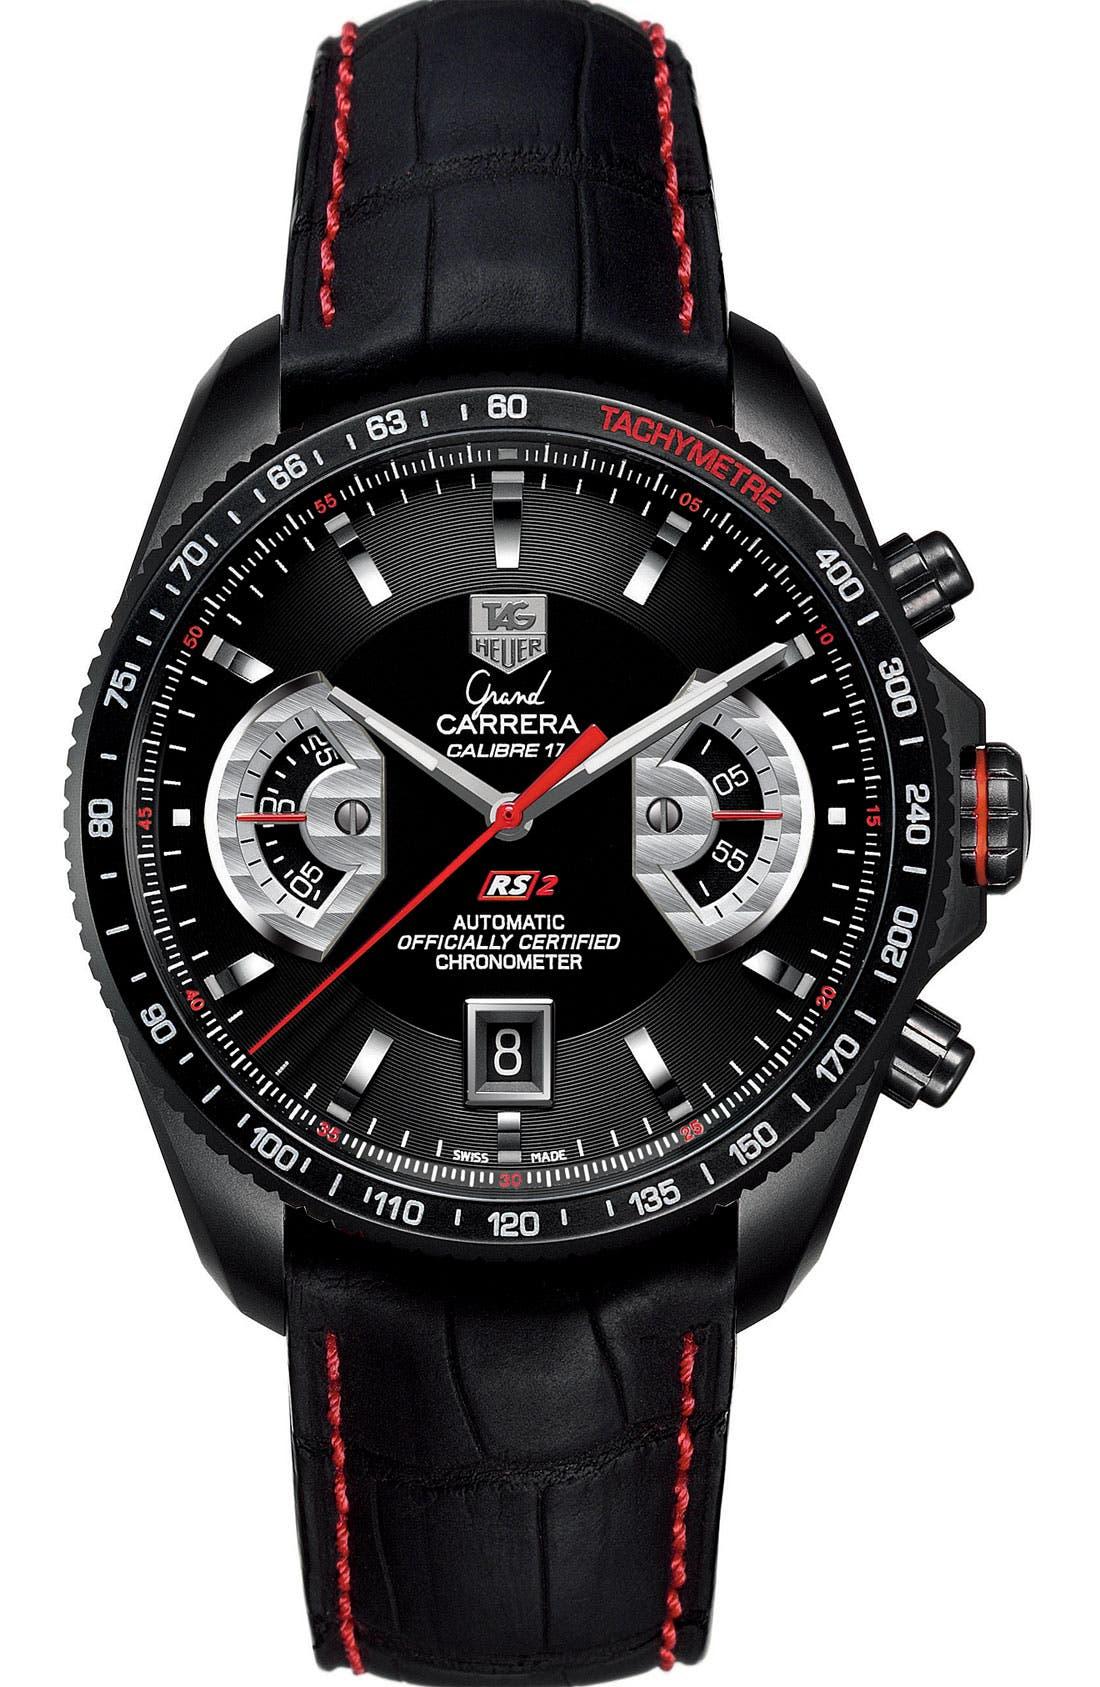 Main Image - TAG Heuer 'Grand Carrera' Chronograph Watch